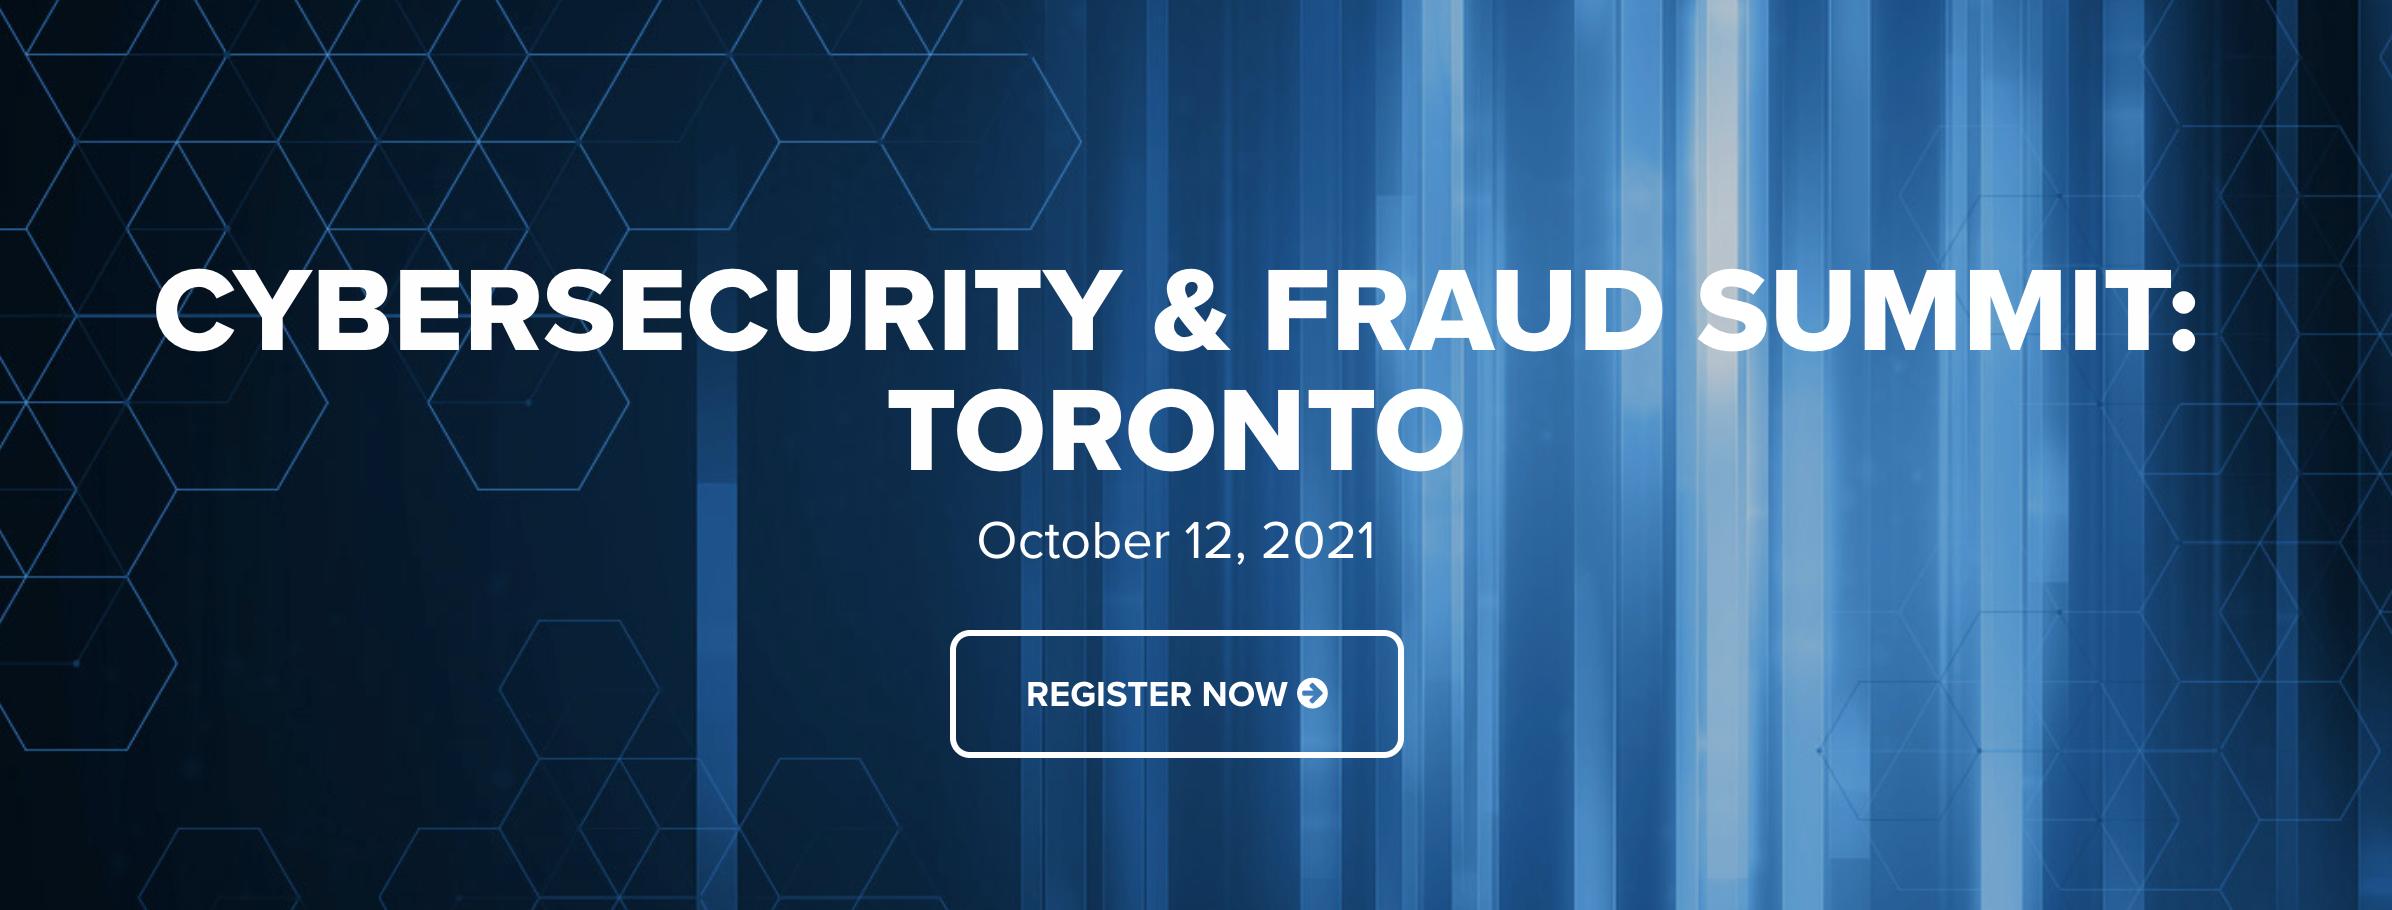 Cybersecurity & Fraud Summit: Toronto